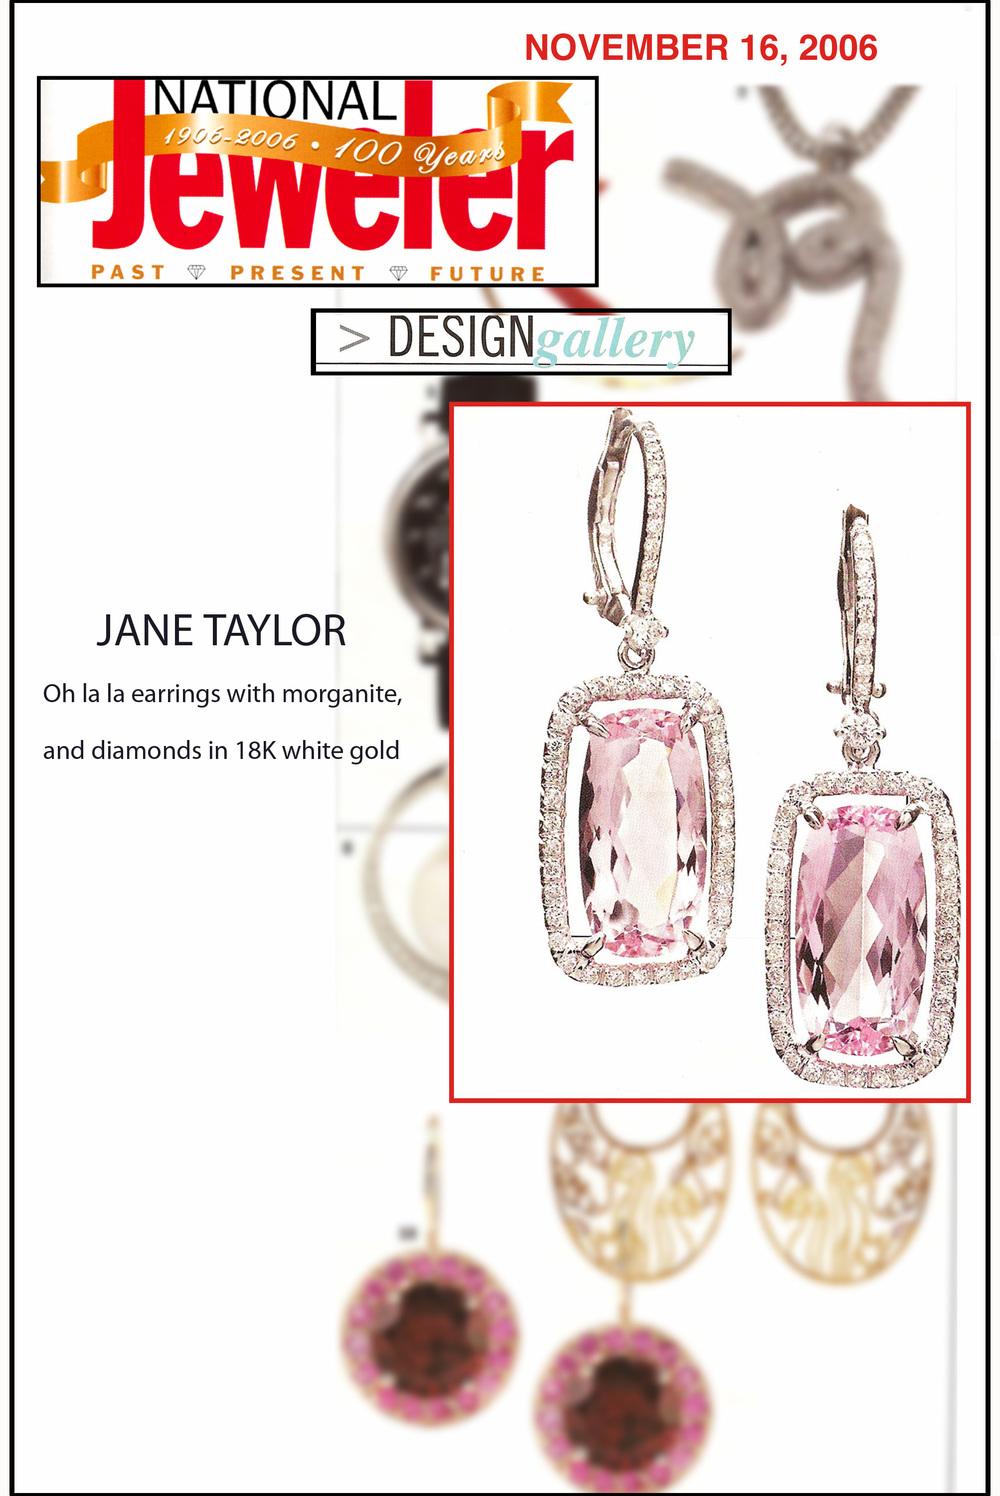 2006-11.16-National Jeweler.jpg